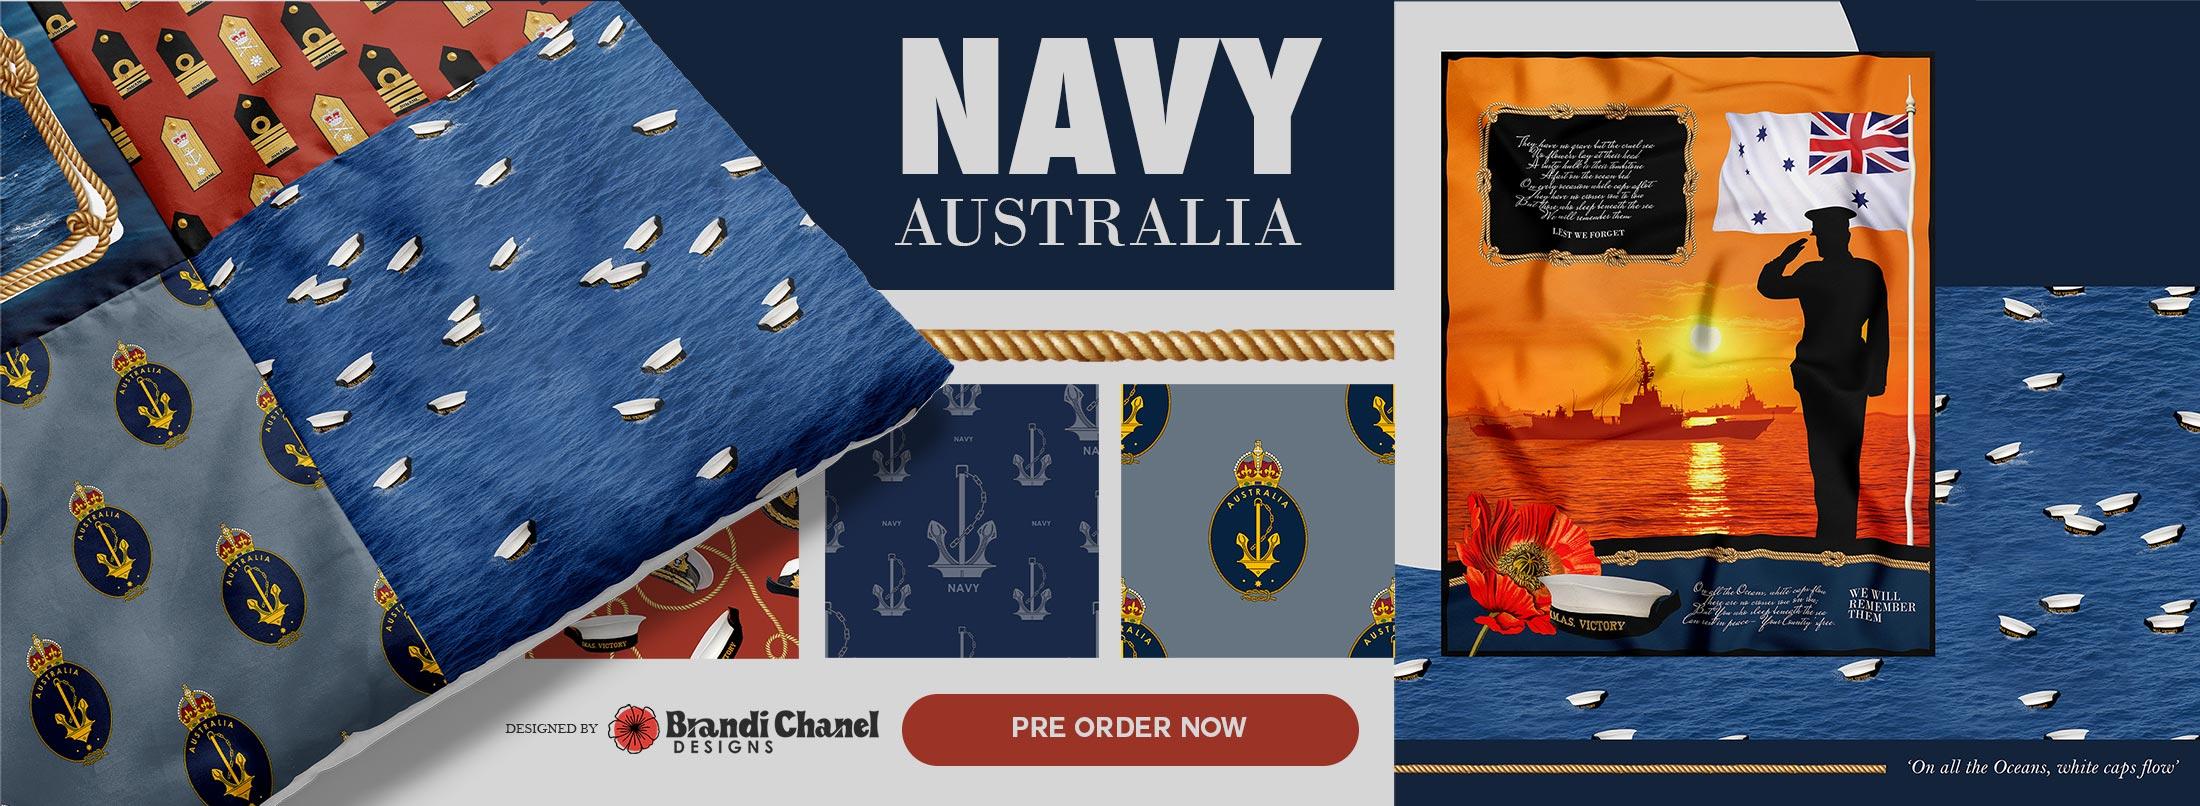 Navy Australia 1044